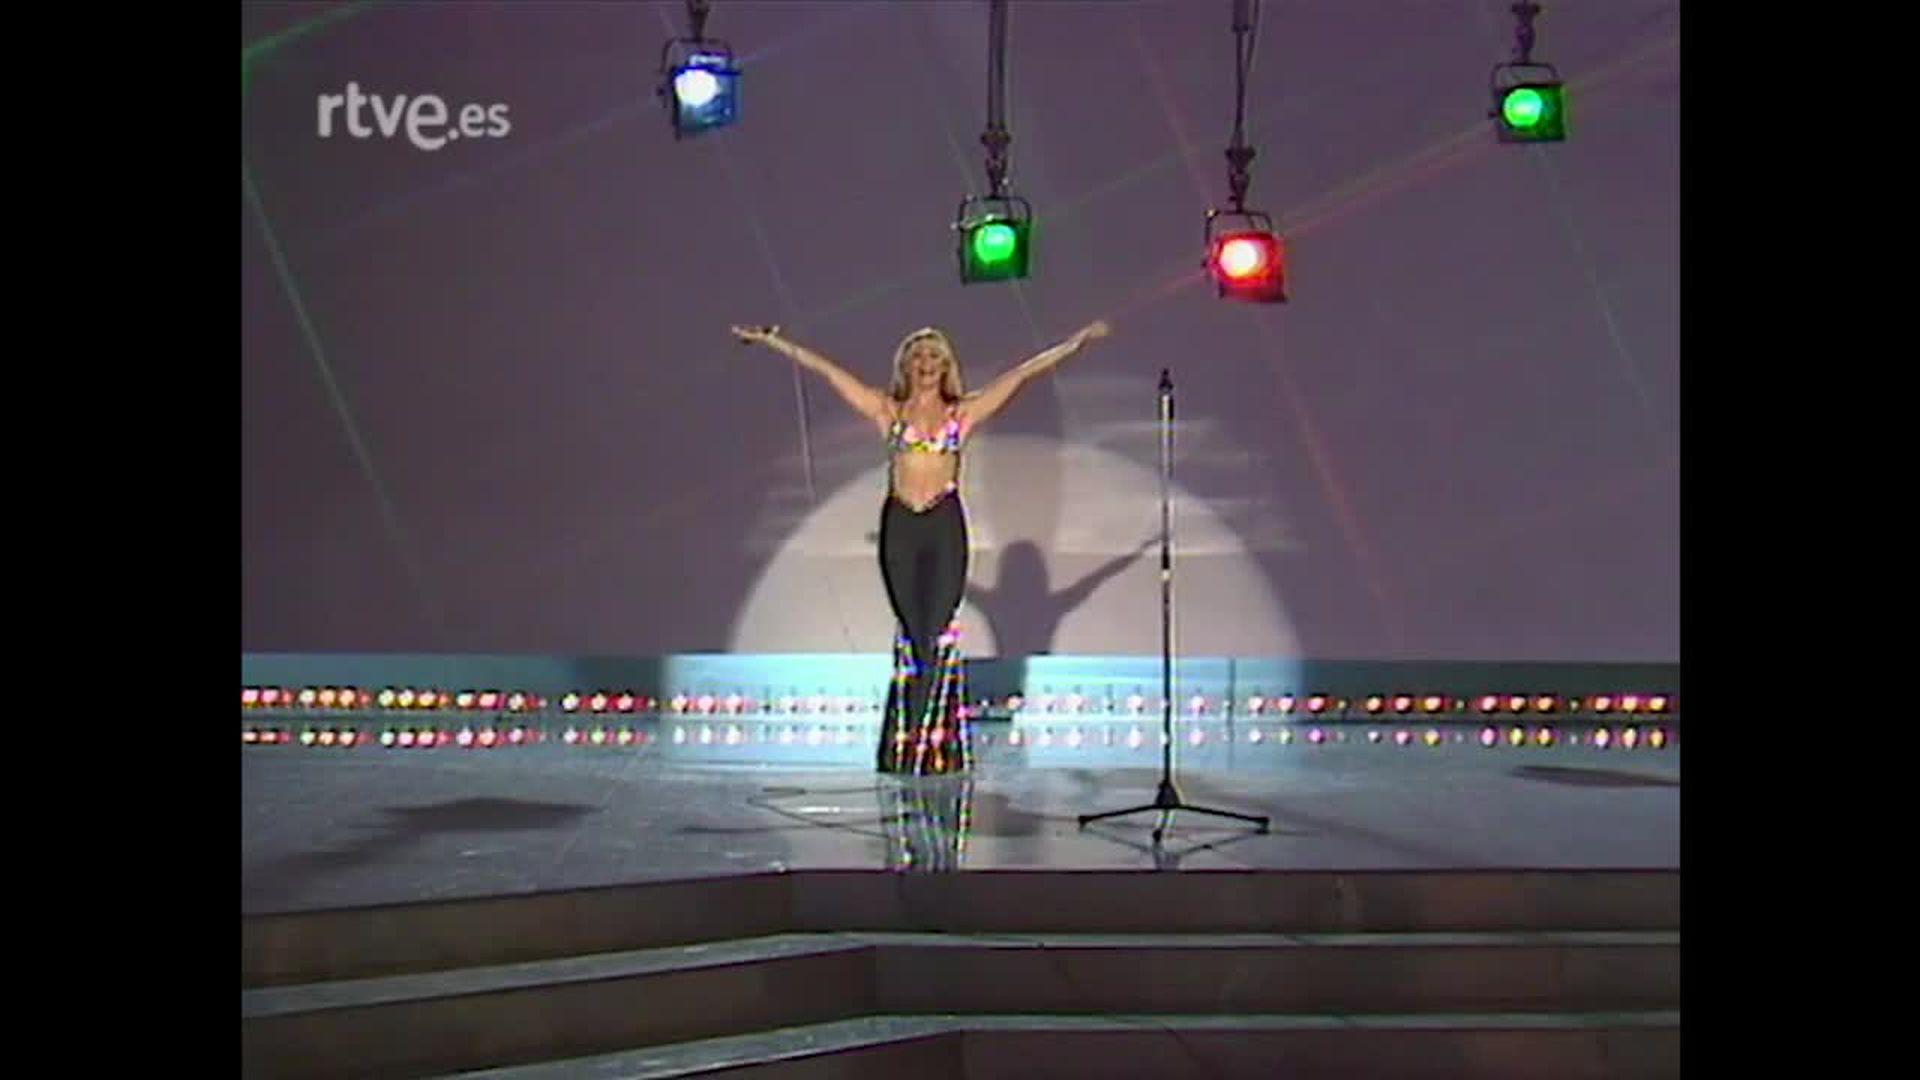 Como cantante, Carrà desplegó un repertorio popular y pegadizo